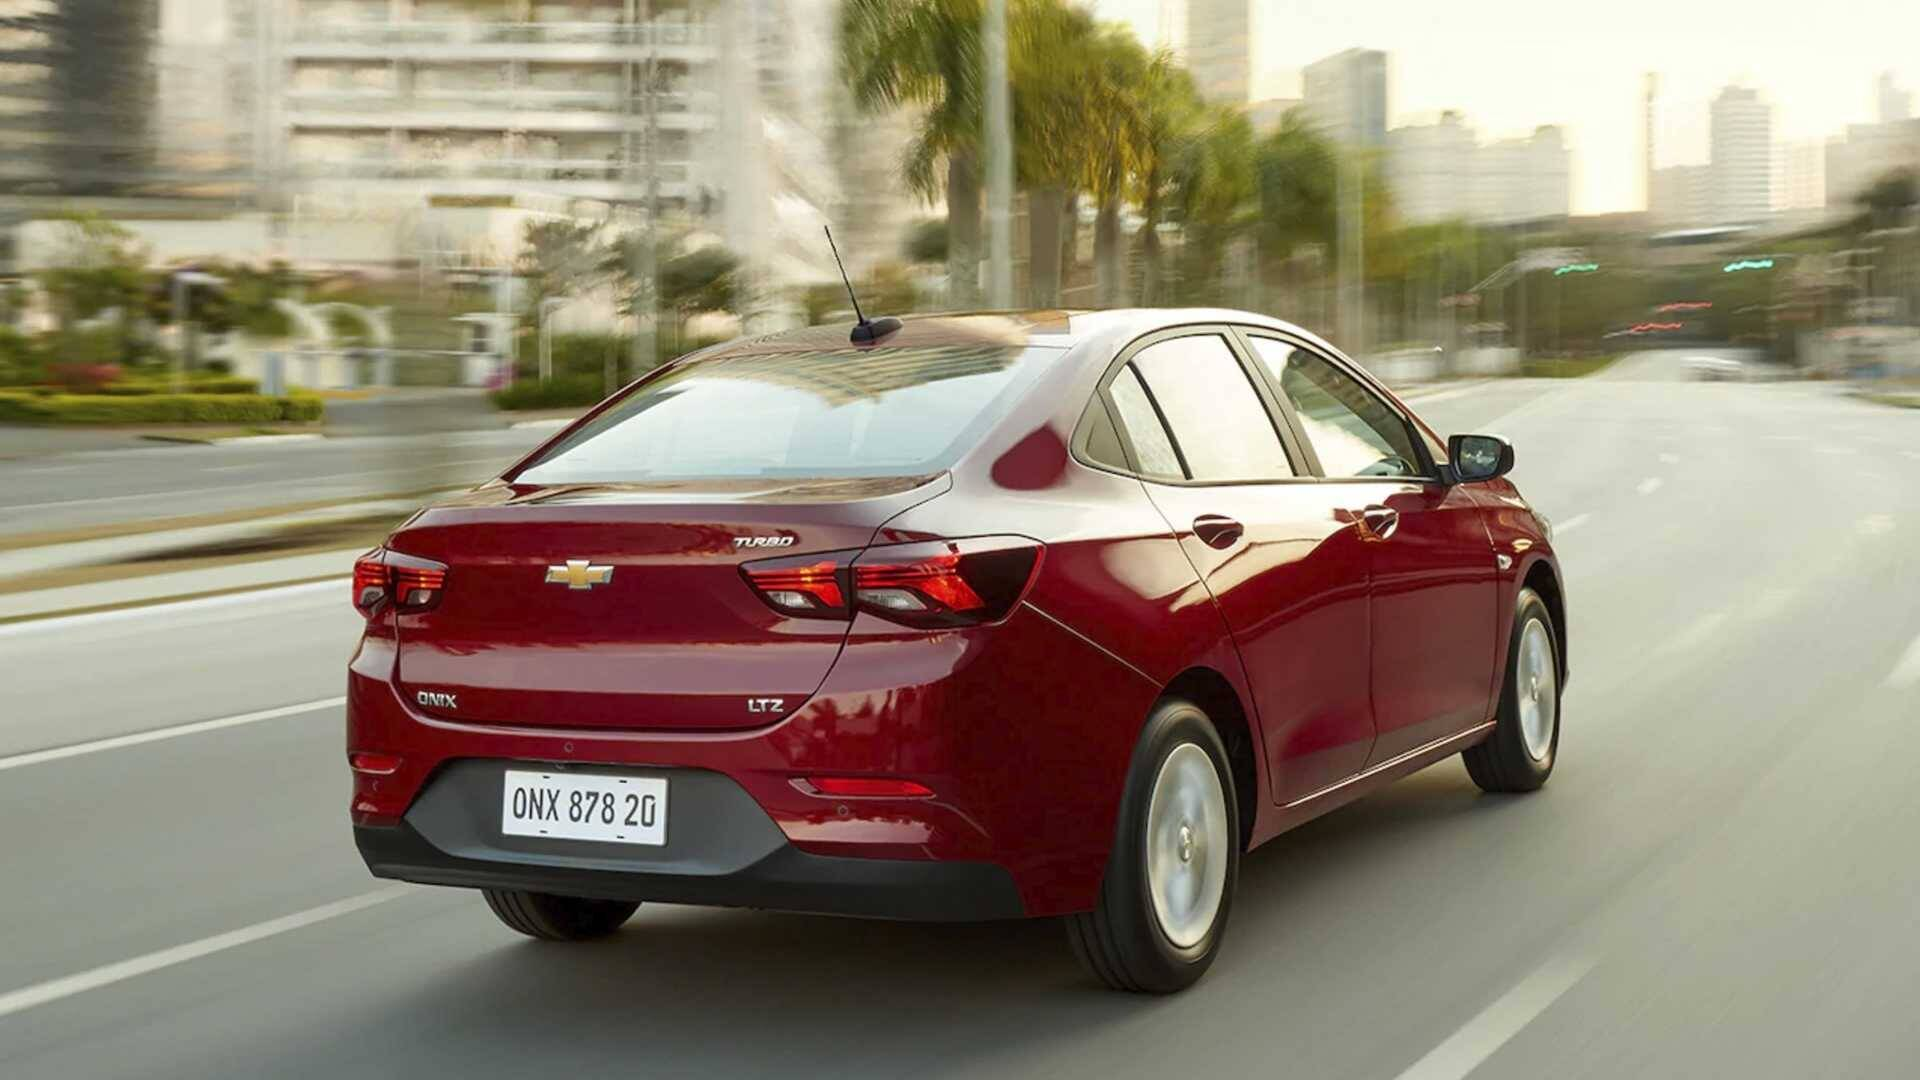 Chevrolet Onix Plus. Foto: Divulgação